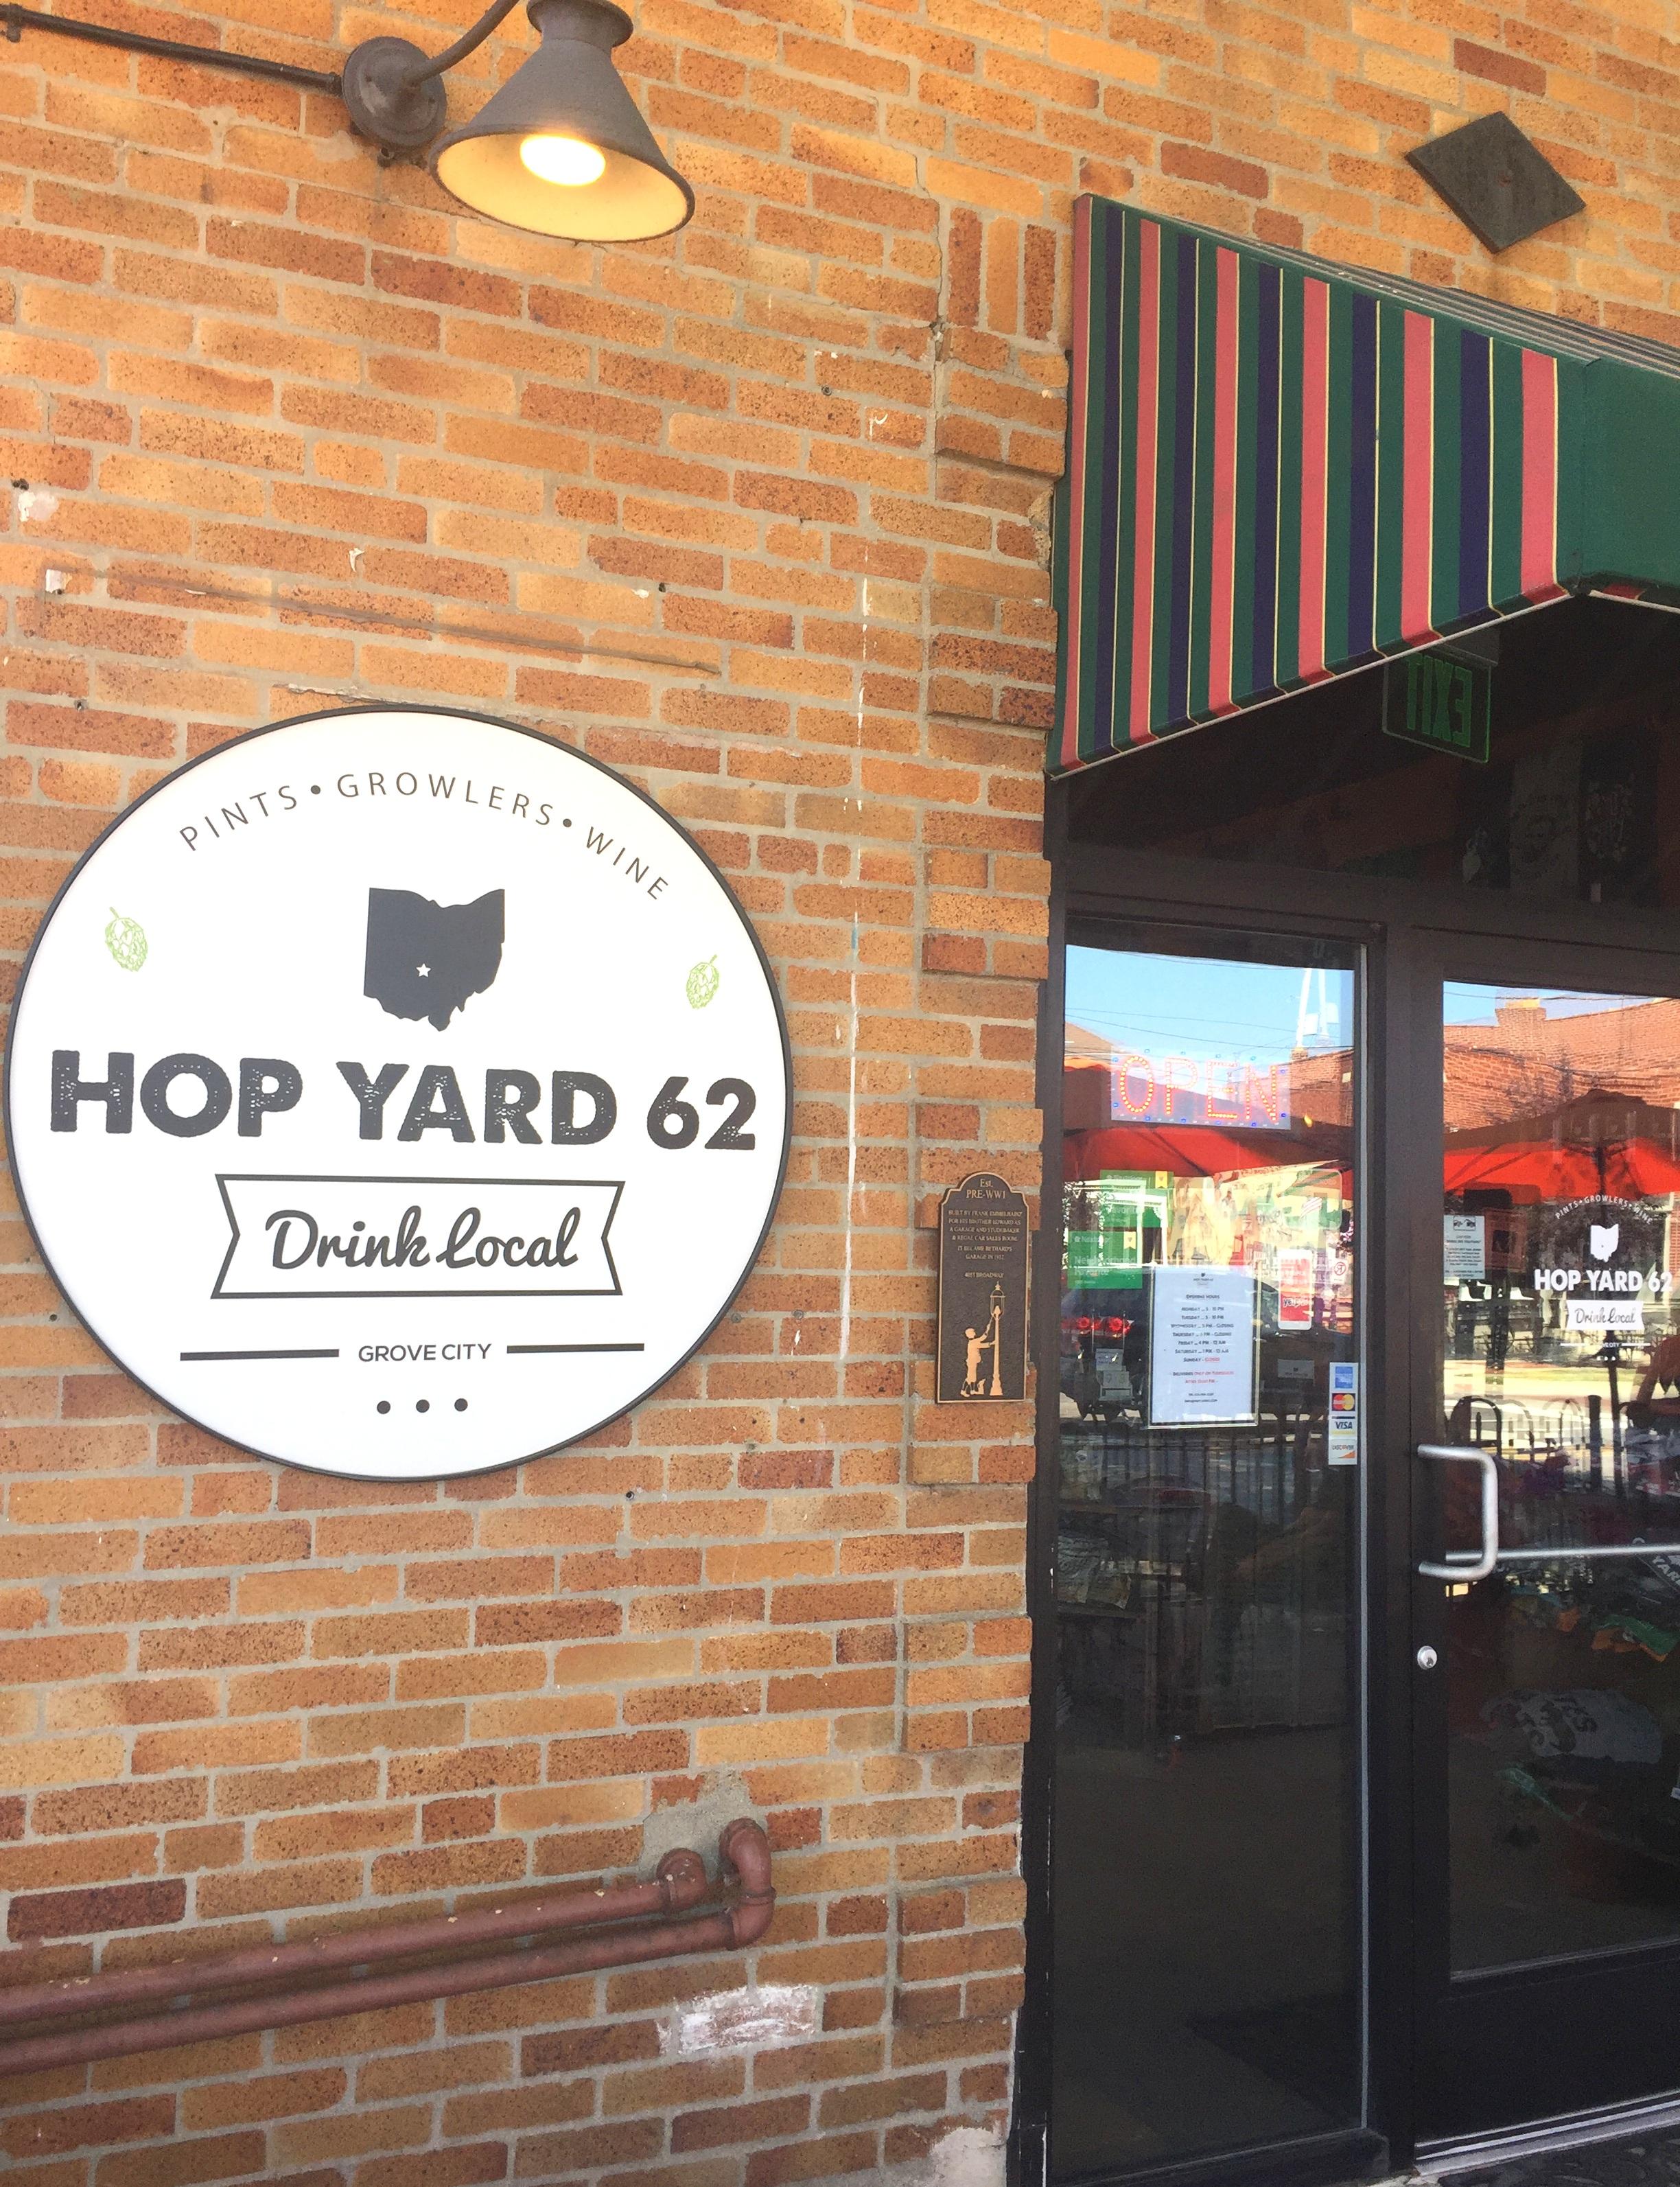 Hop Yard 62: Grove City's Hometown Hangout